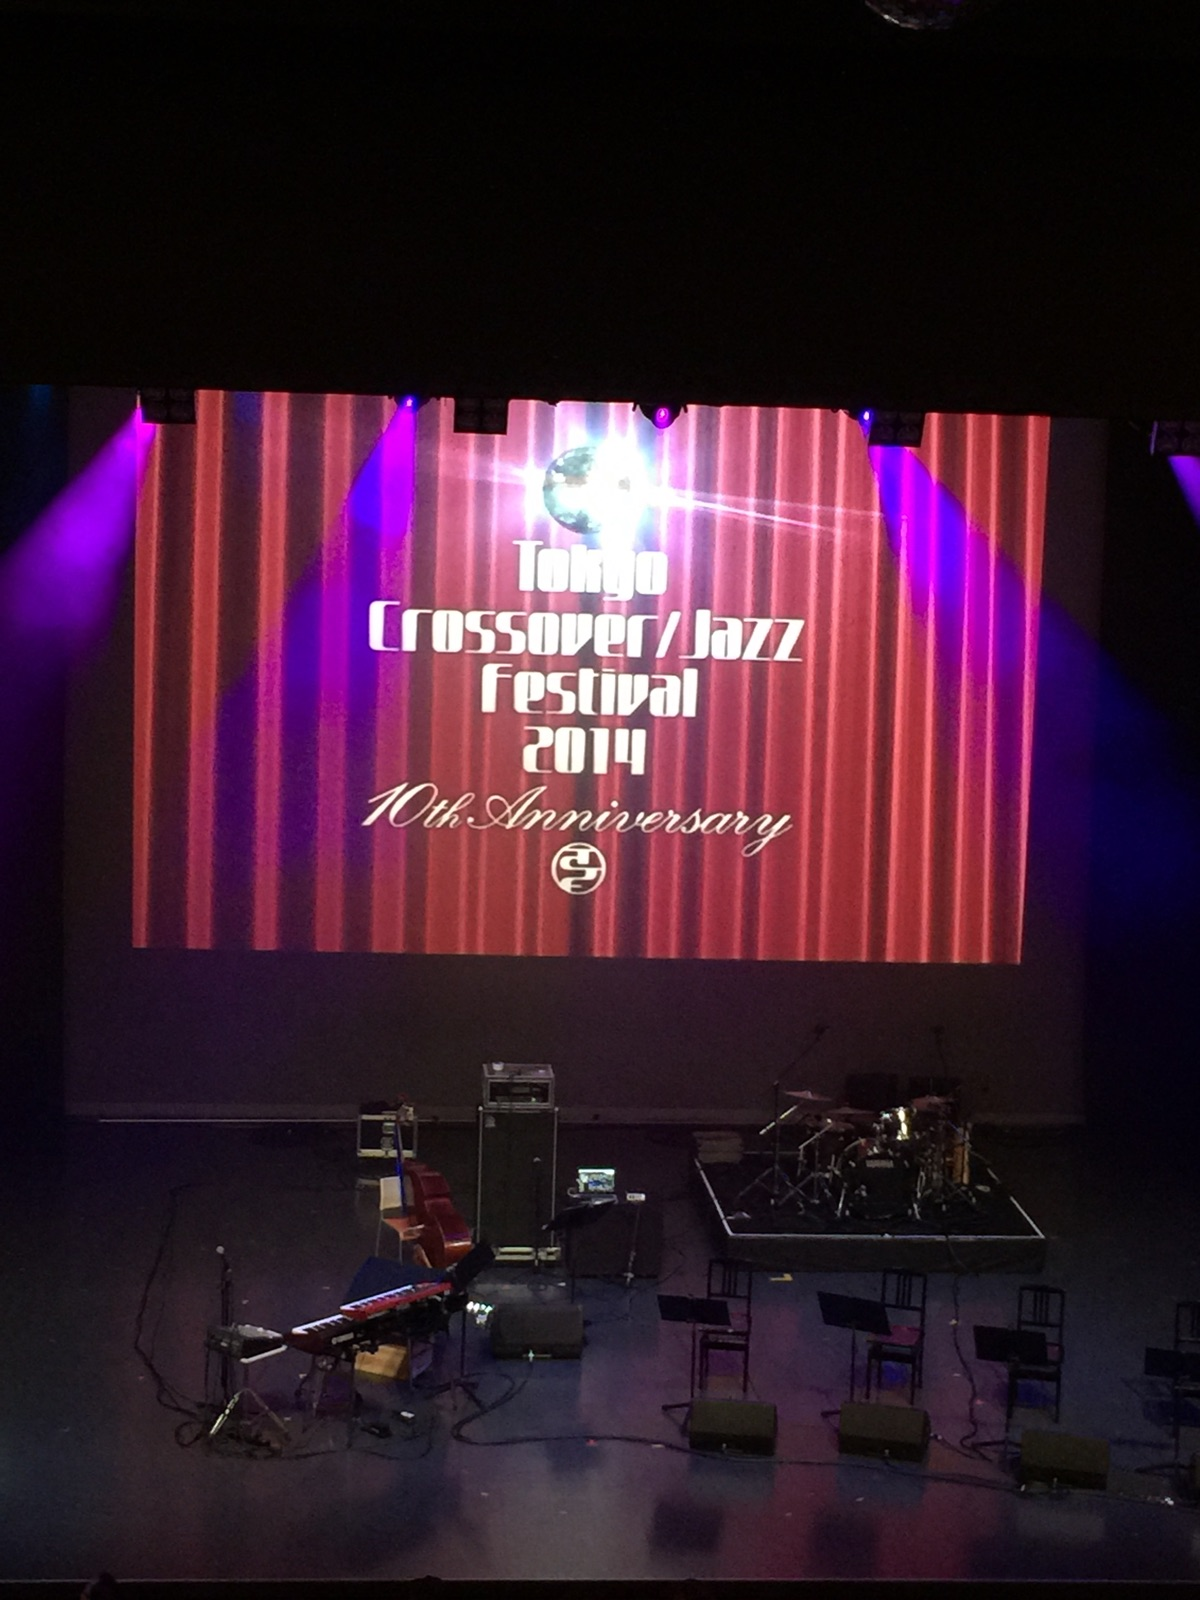 Tokyo Crossover/Jazz Festival 2014 10th Anniversary